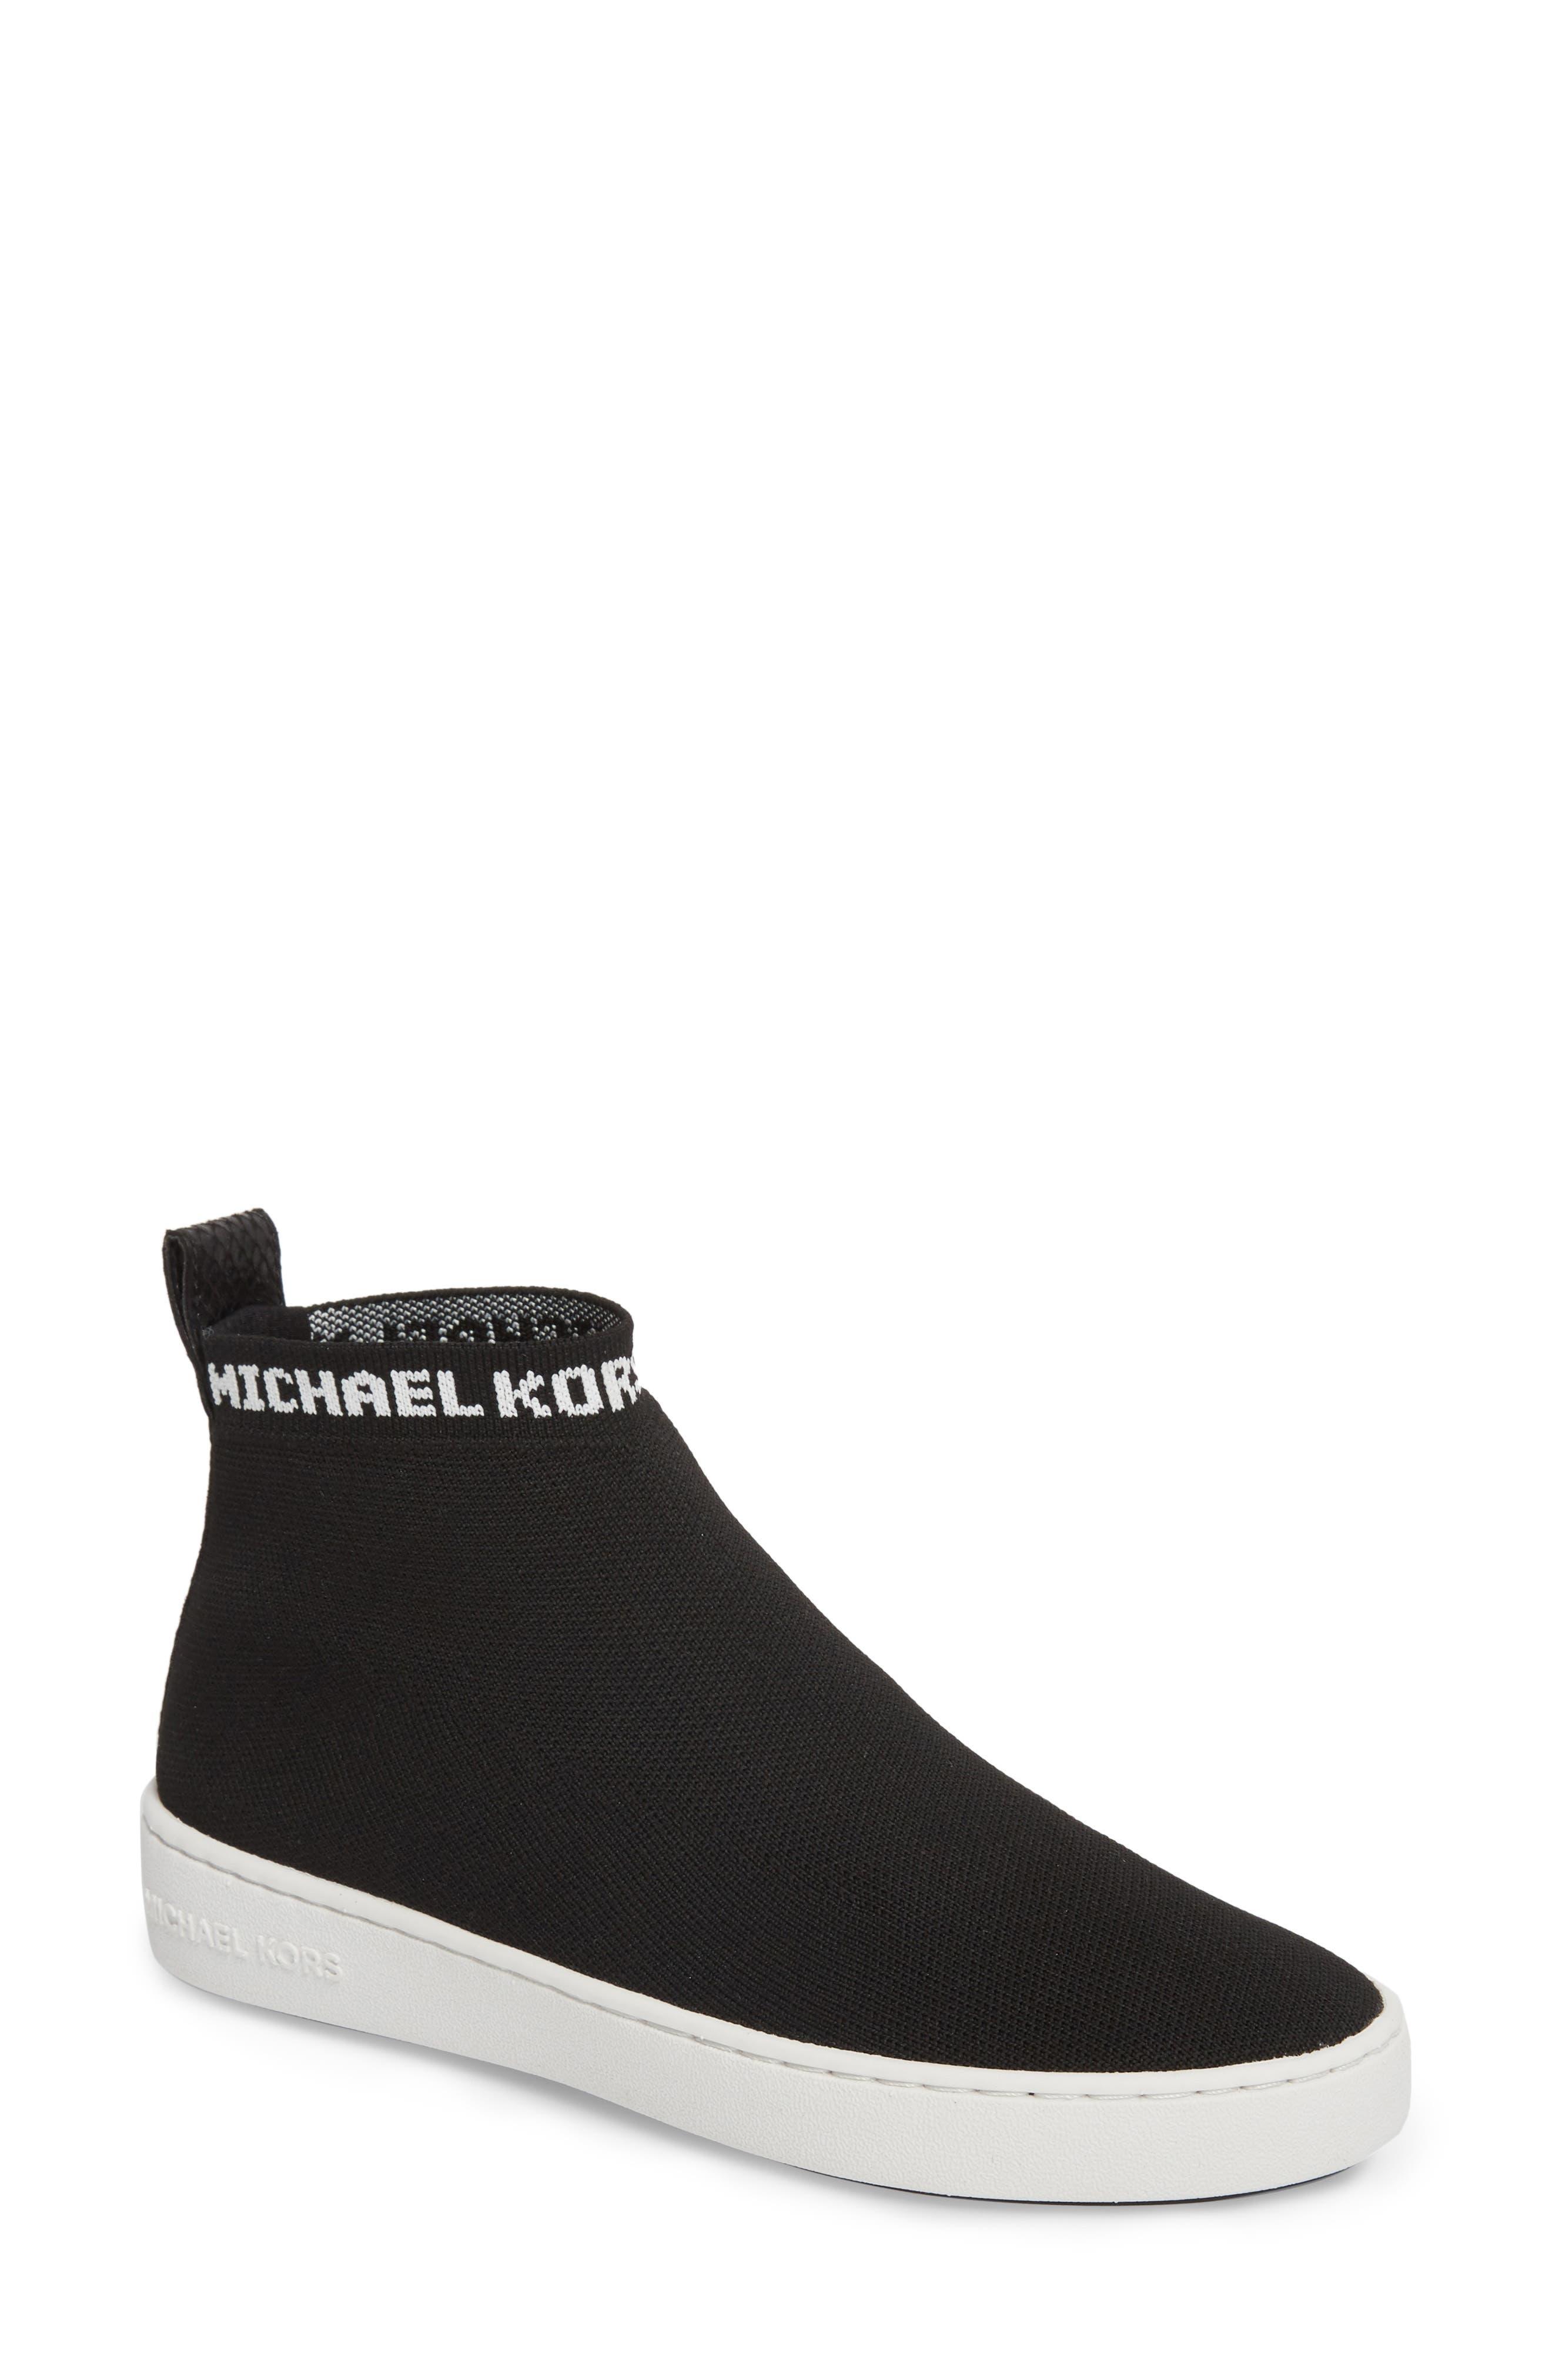 Hilda High Top Sock Sneaker,                             Main thumbnail 1, color,                             Black Knit Fabric